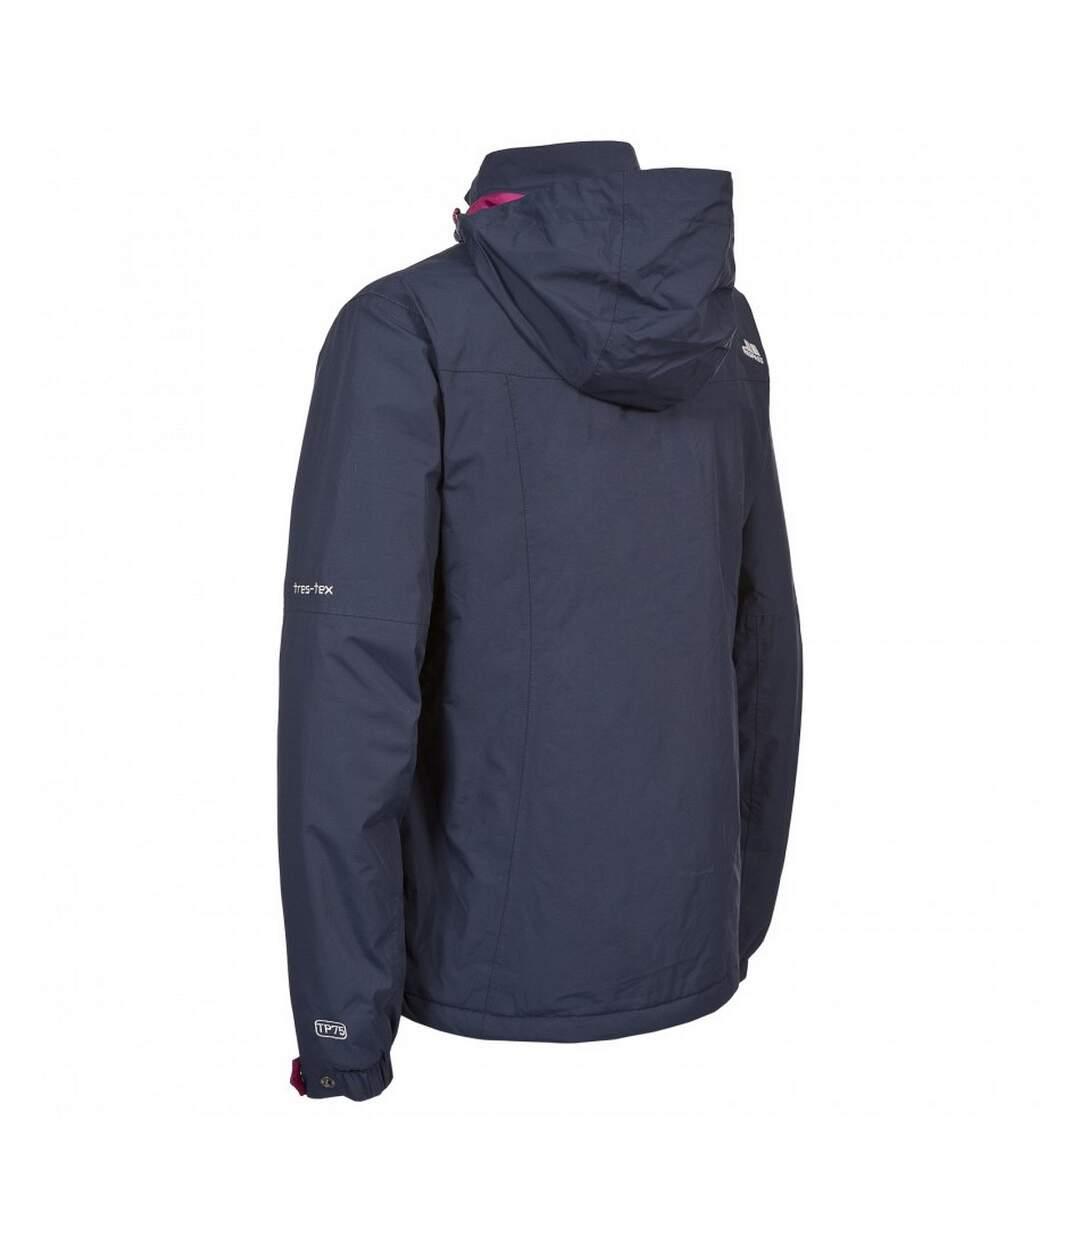 Trespass Womens/Ladies Malissa Lightly Padded Waterproof Jacket (Navy) - UTTP3070